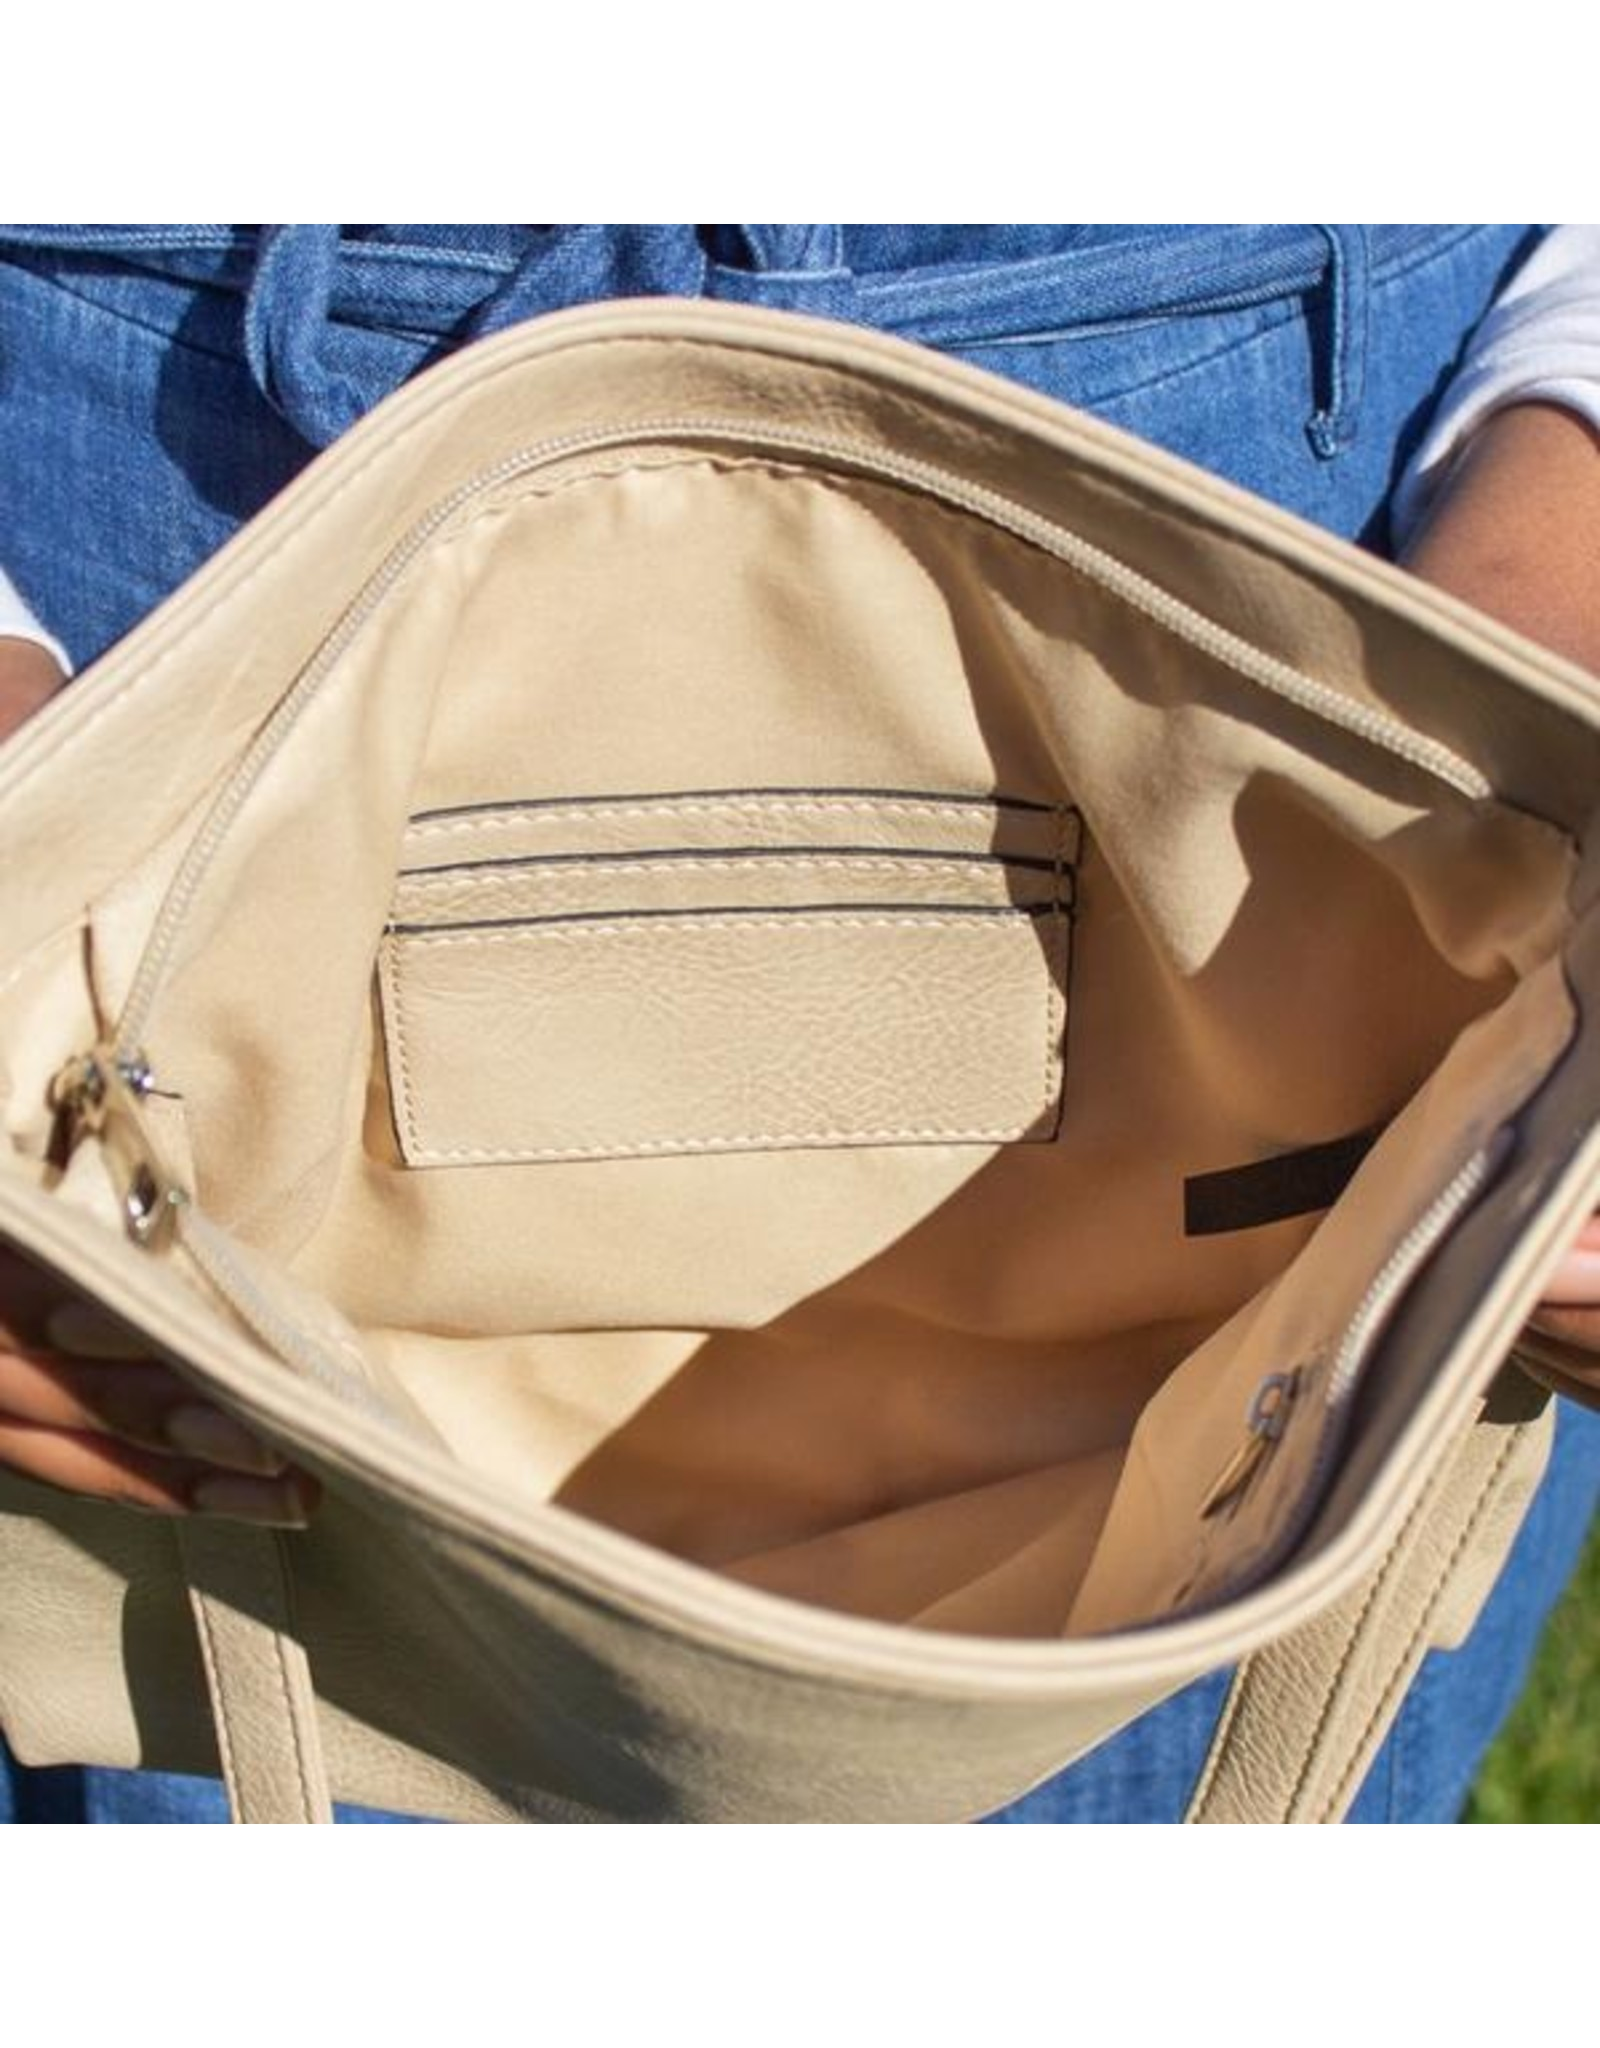 K.Carroll K.Carroll Xbody Zip Bag 6841 (S1)